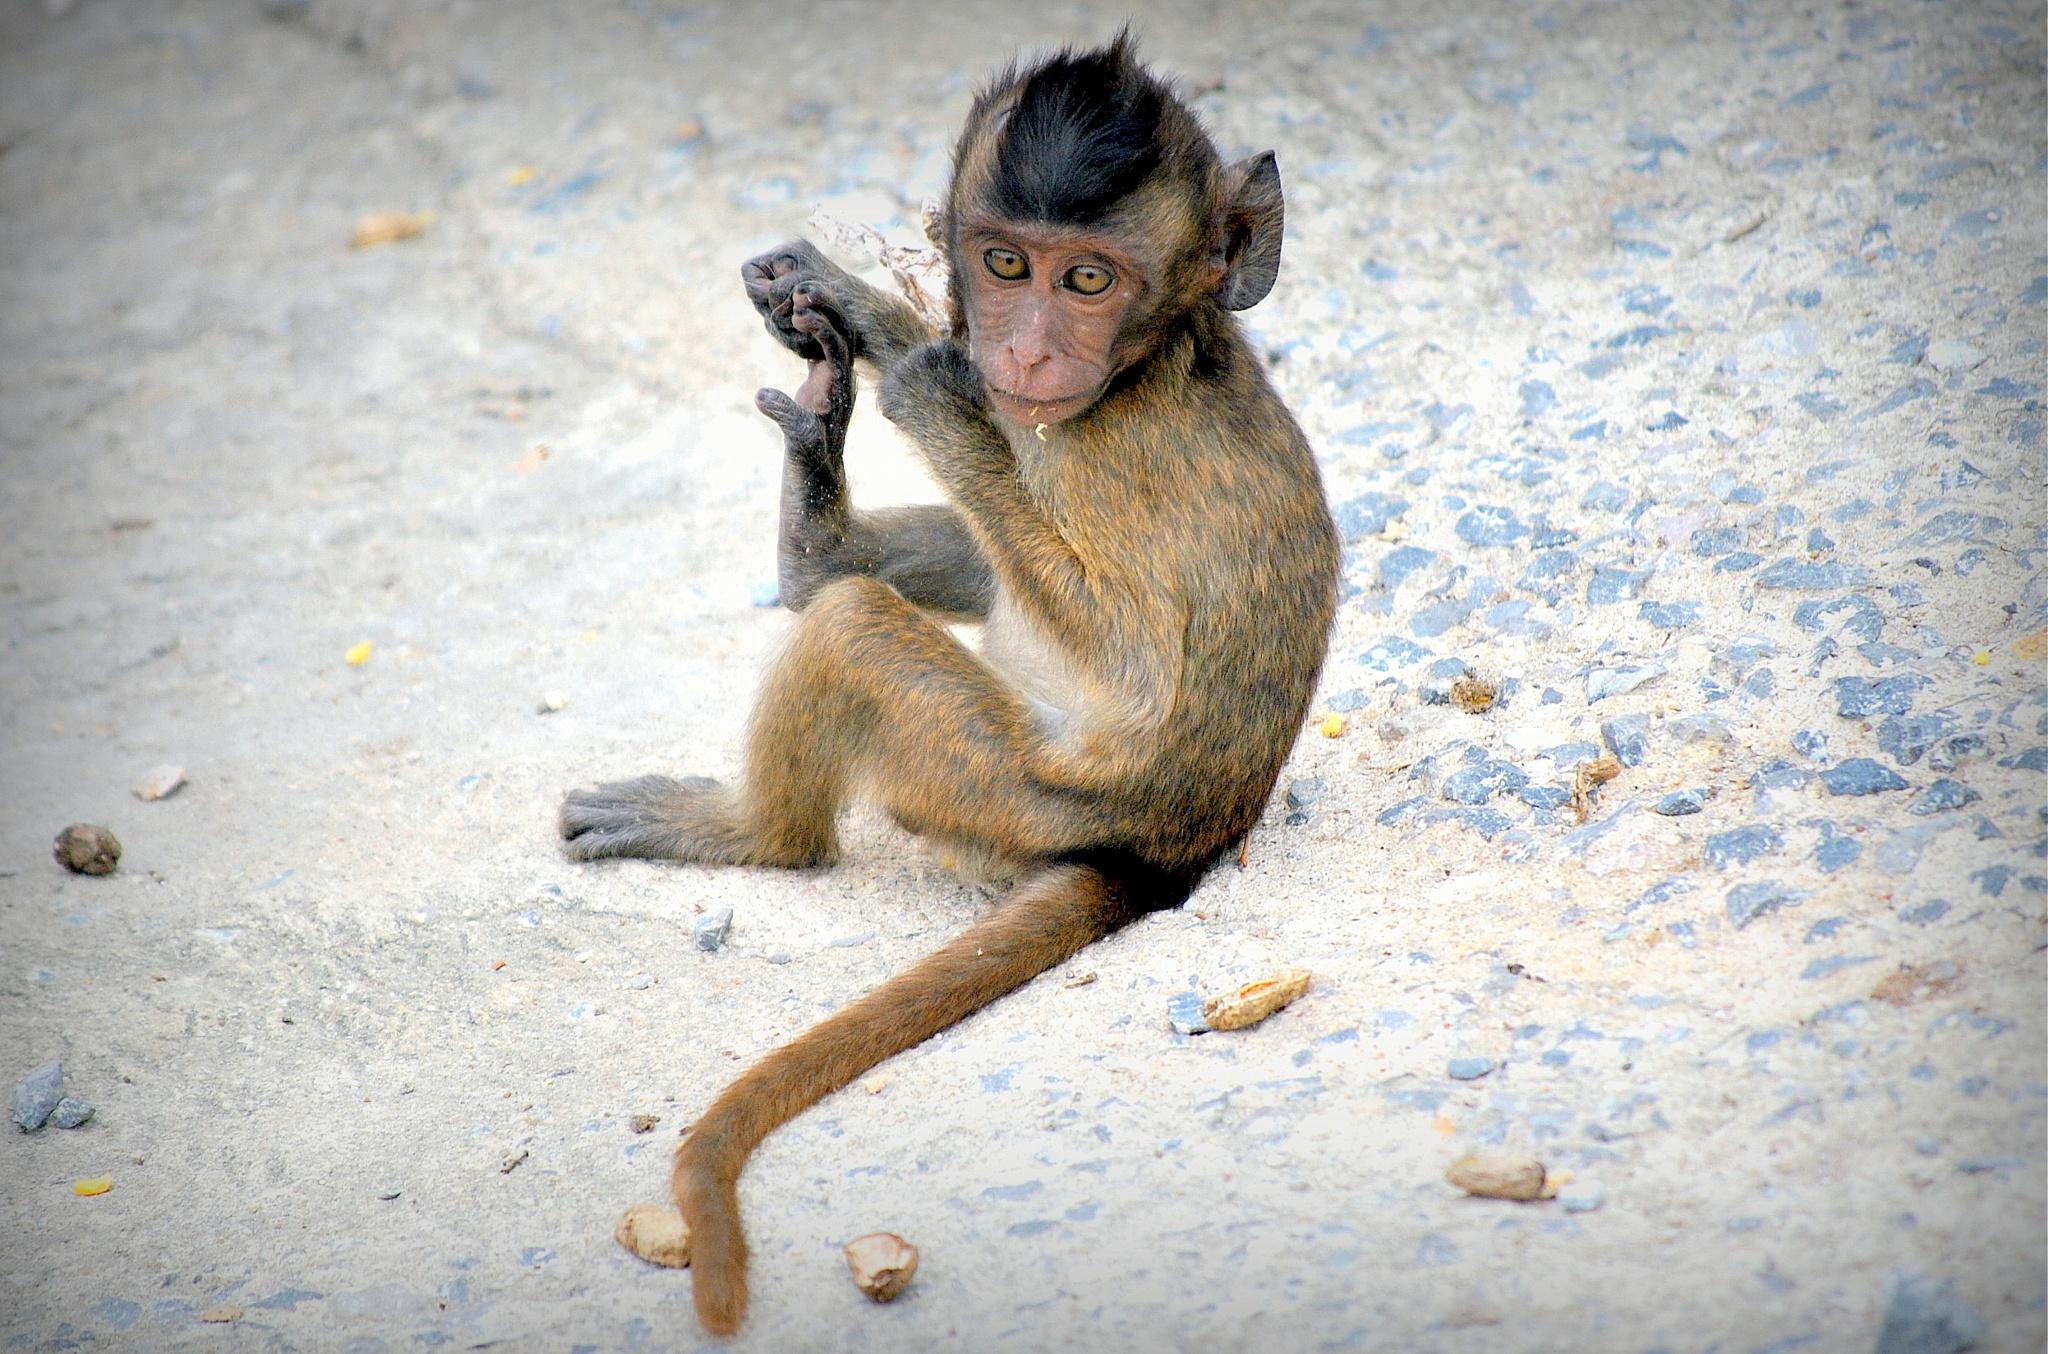 Baby Monkey posing by Fulvio Toso